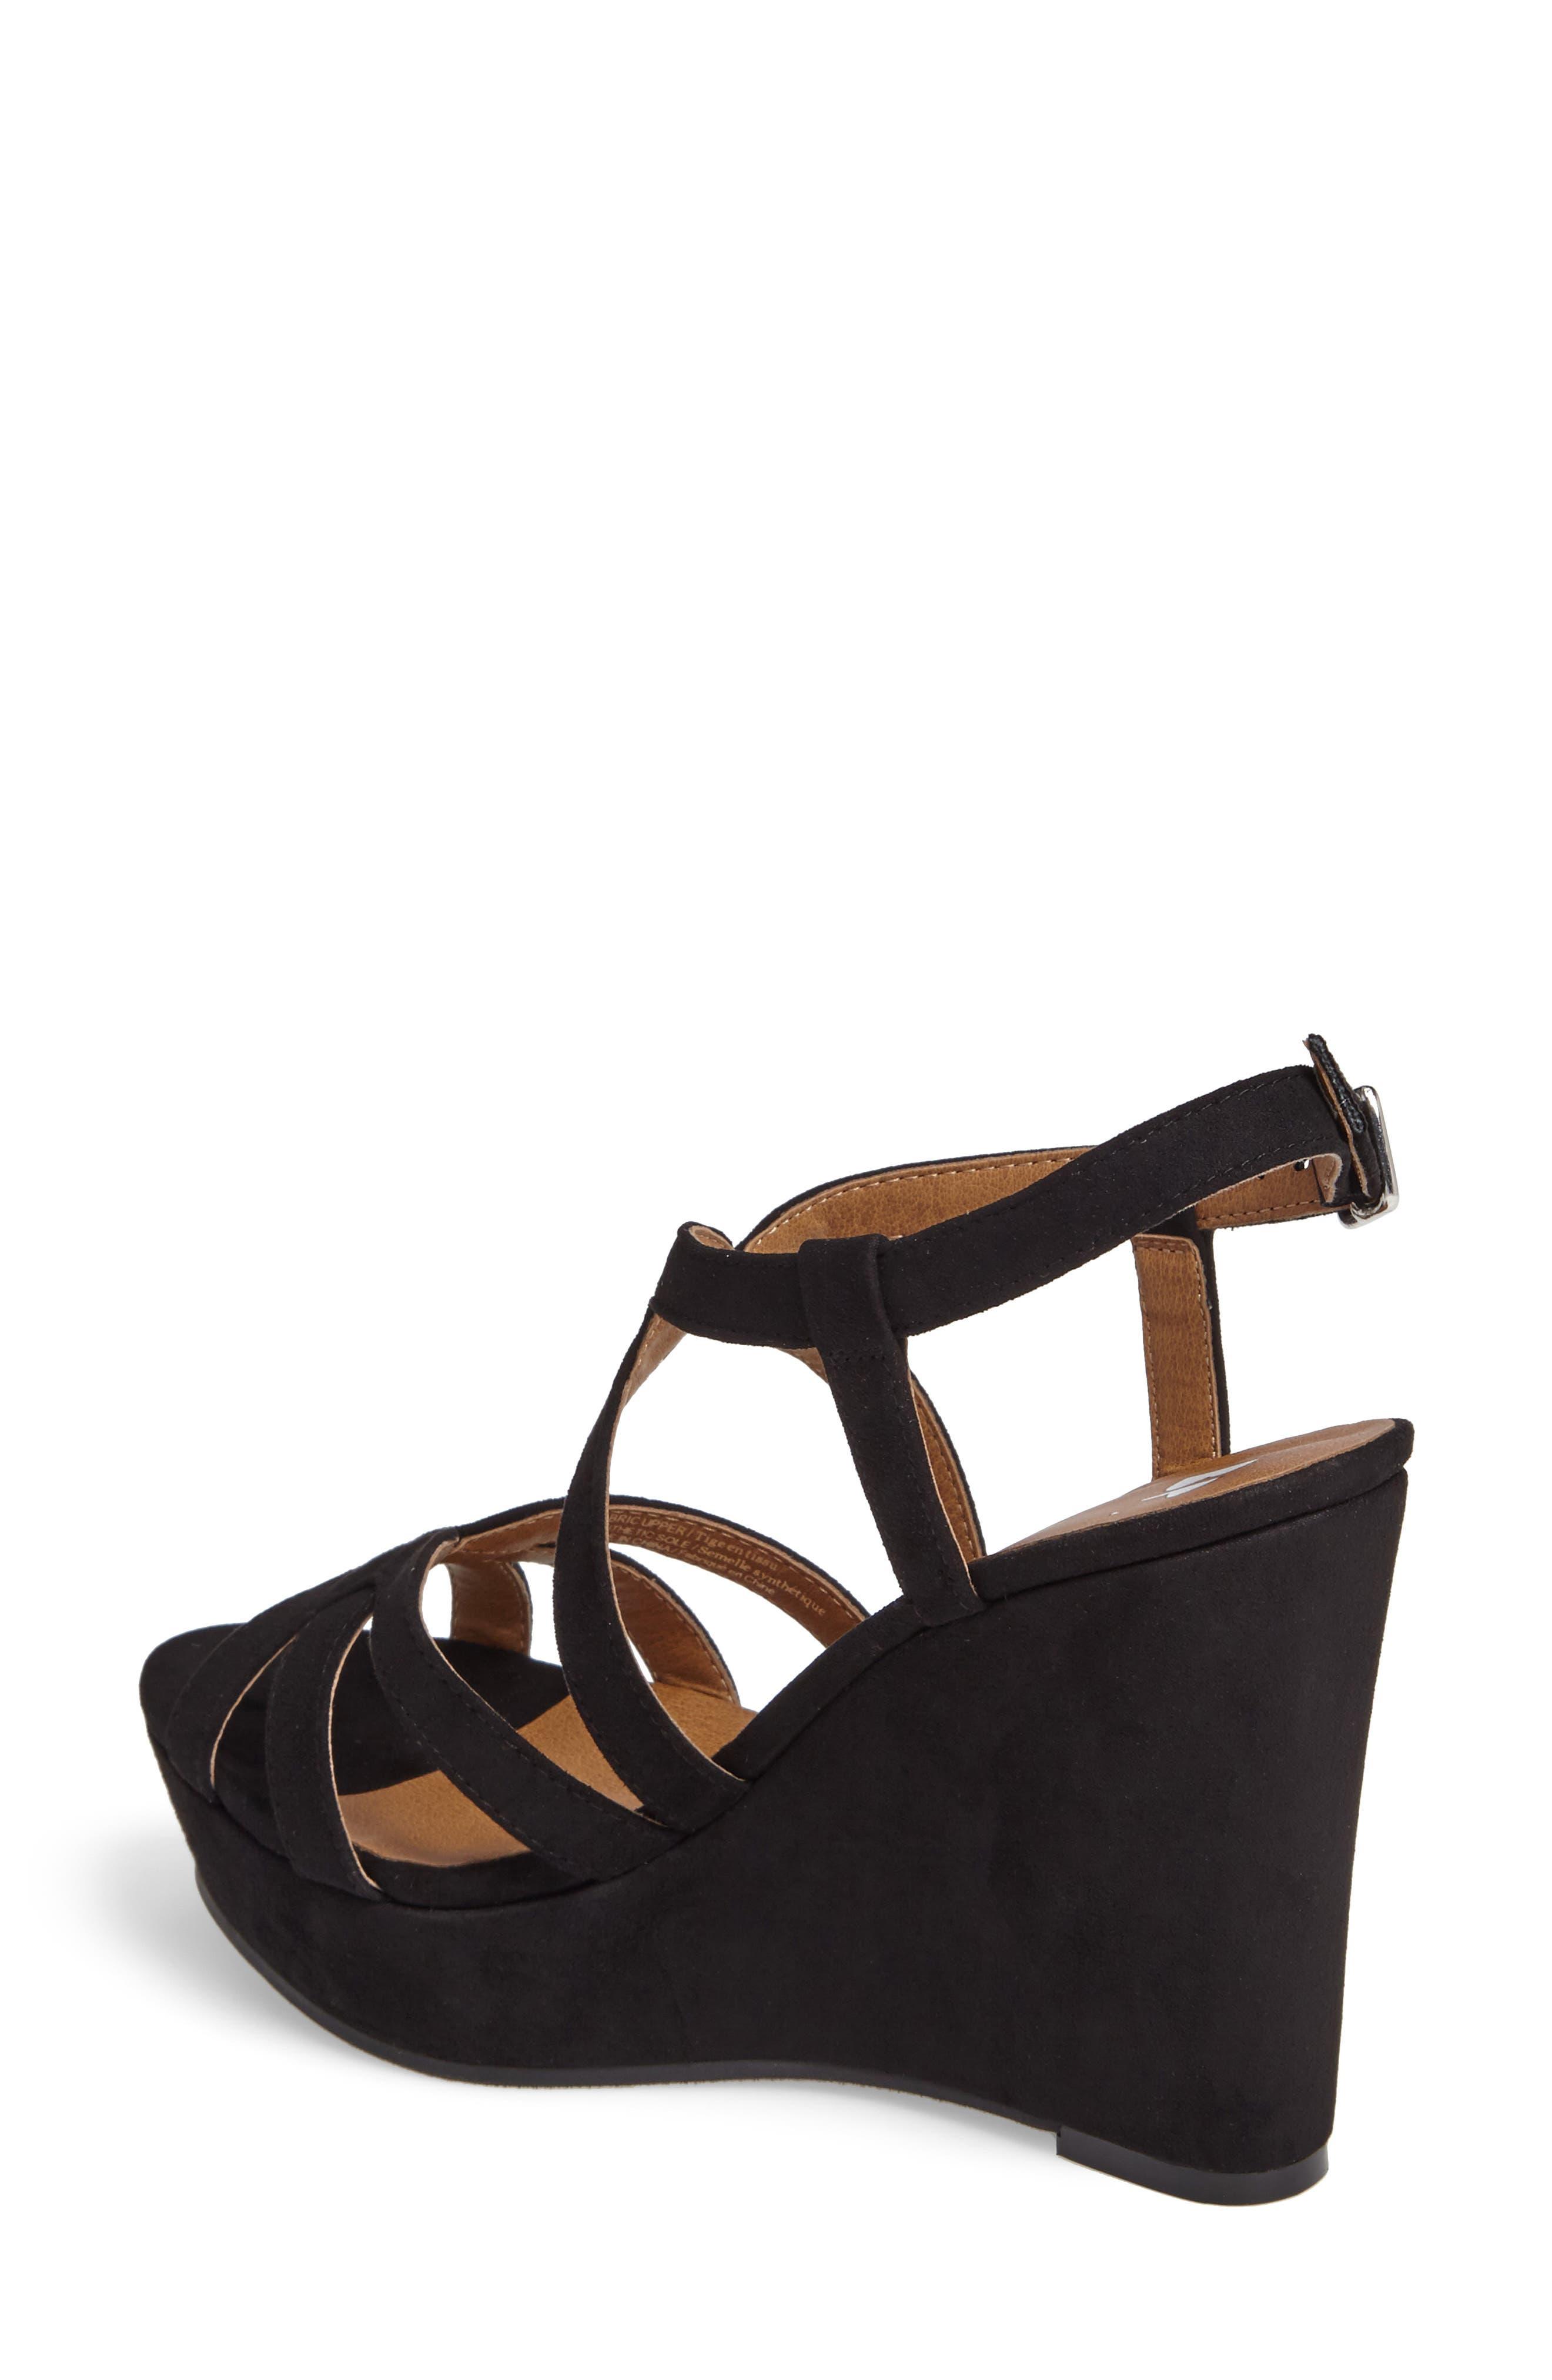 Black sandals nine west - Black Sandals Nine West 35